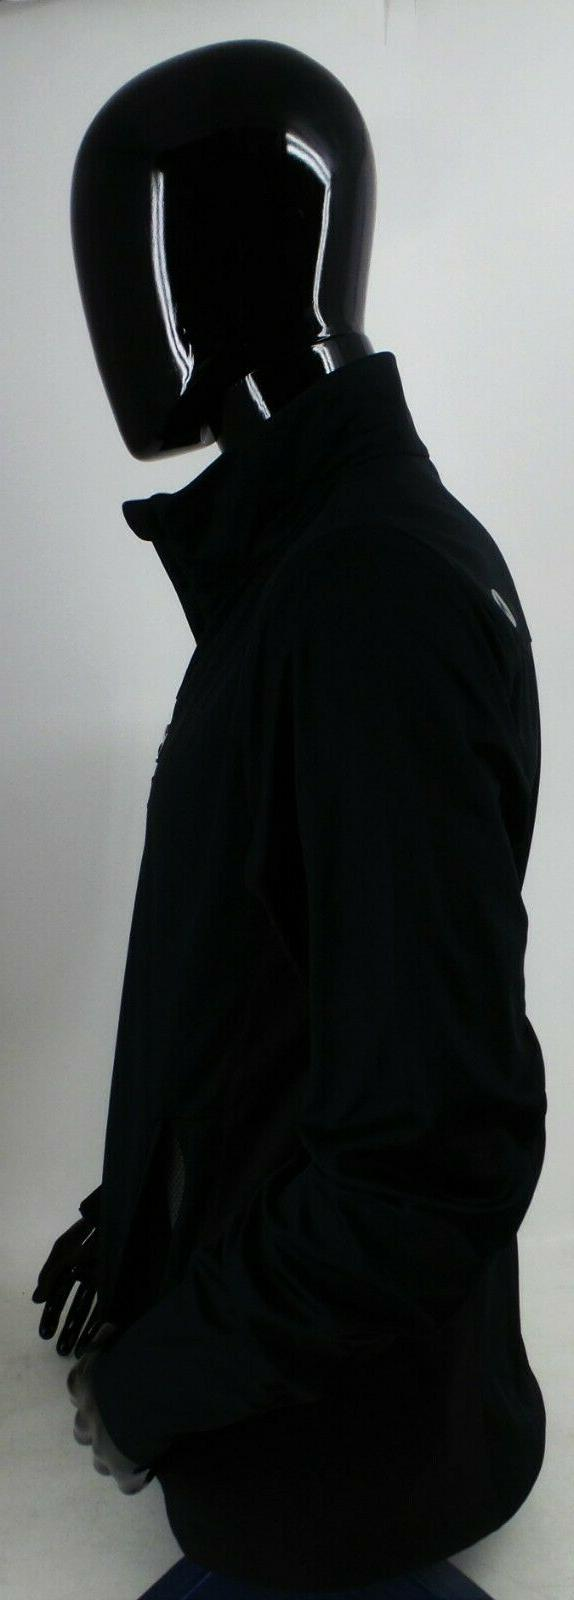 Marmot Men's Softshell Gore-Tex Coat - Size